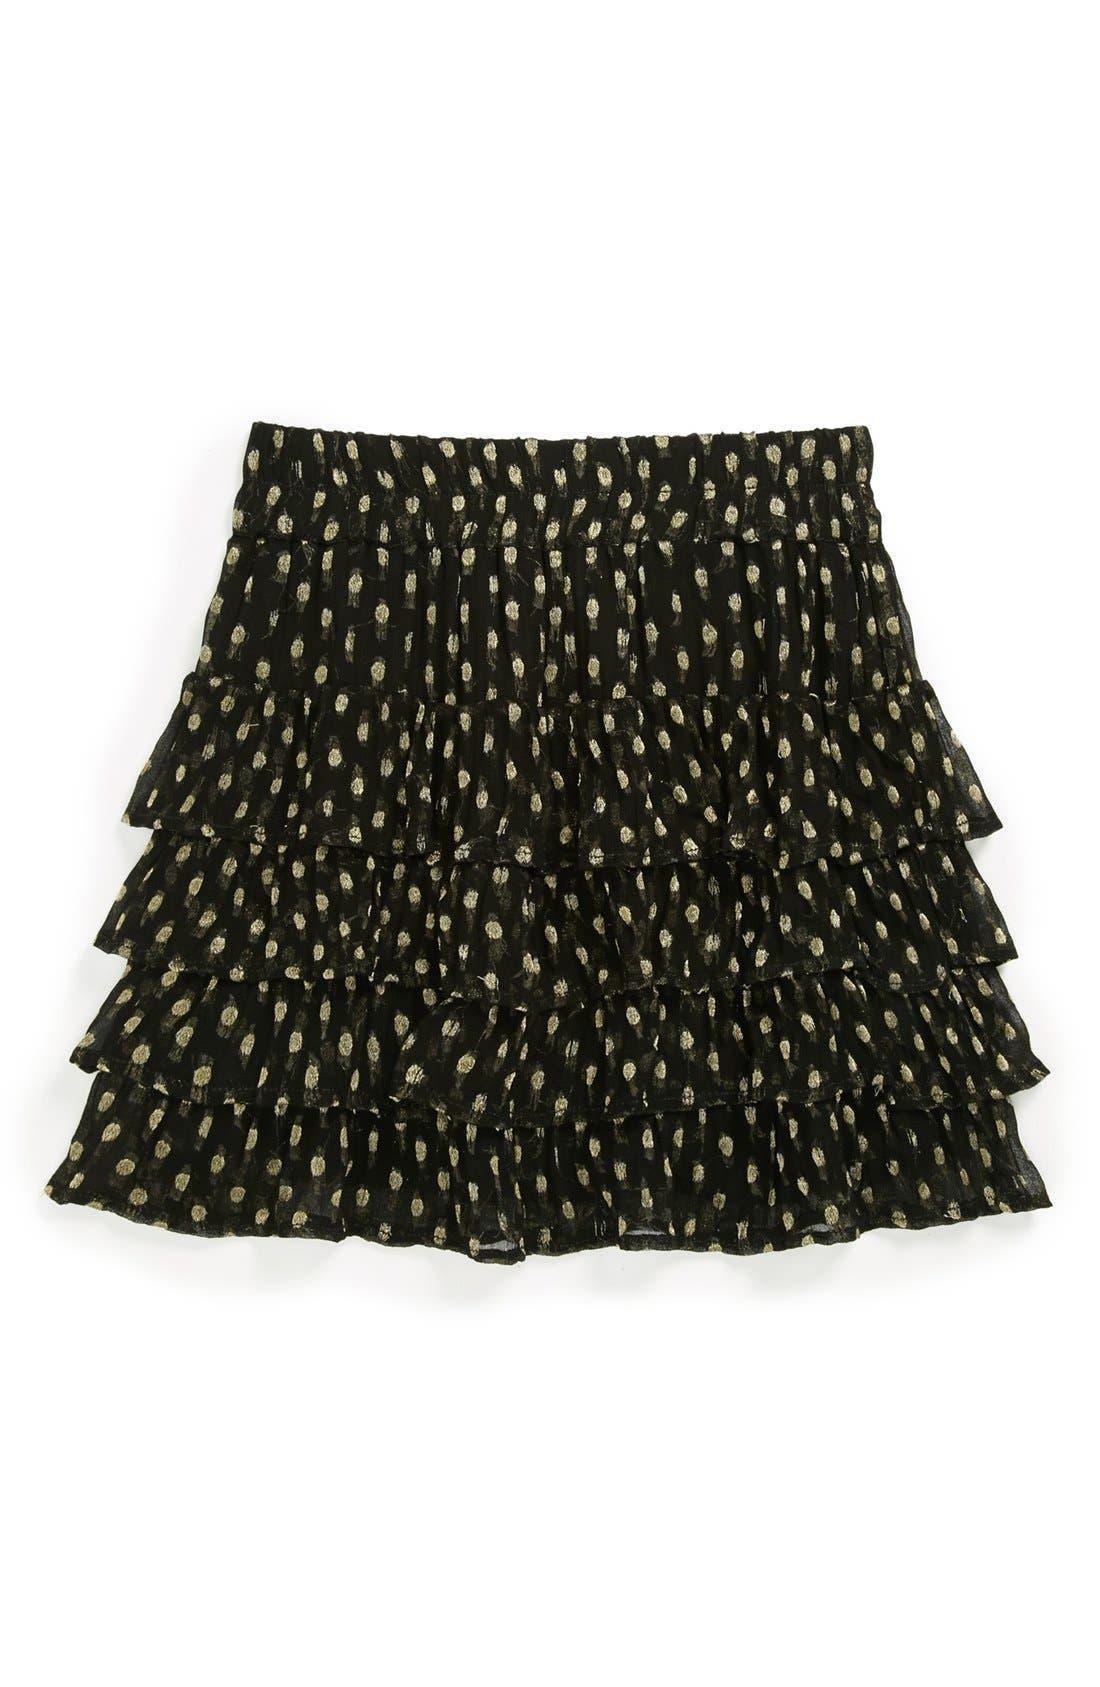 Main Image - Ruby & Bloom 'Leila' Ruffle Skirt (Little Girls & Big Girls)